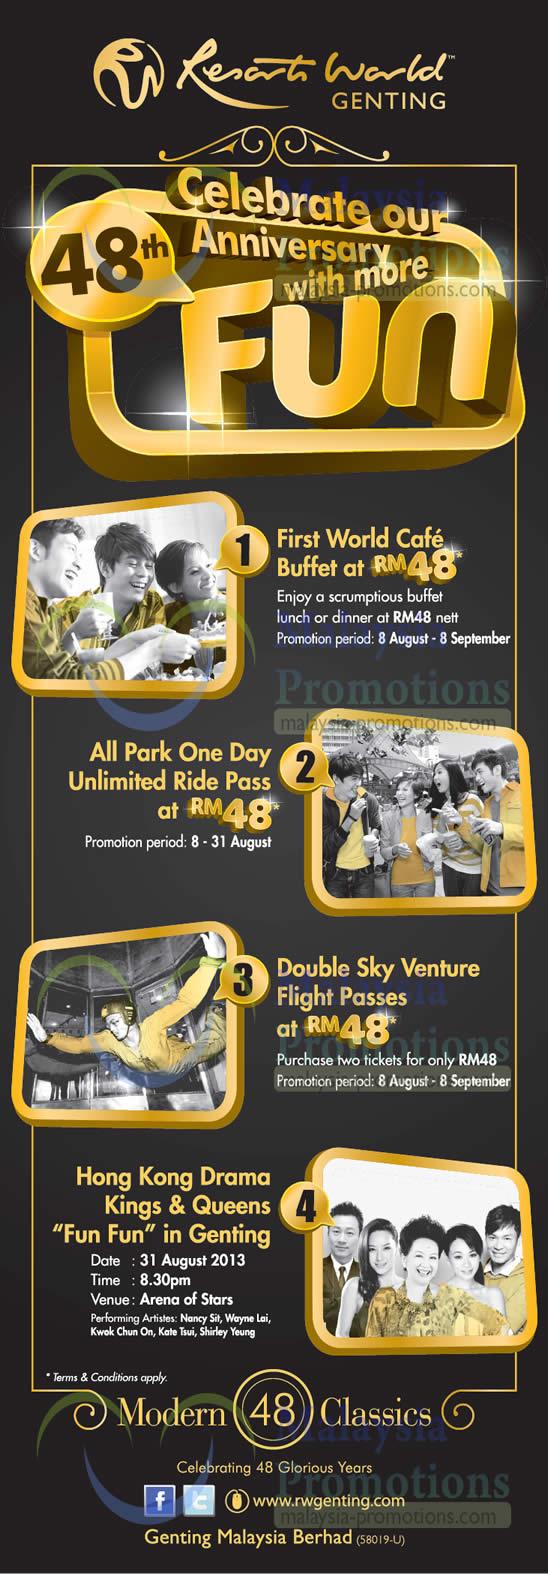 Resorts World Genting 14 Aug 2013